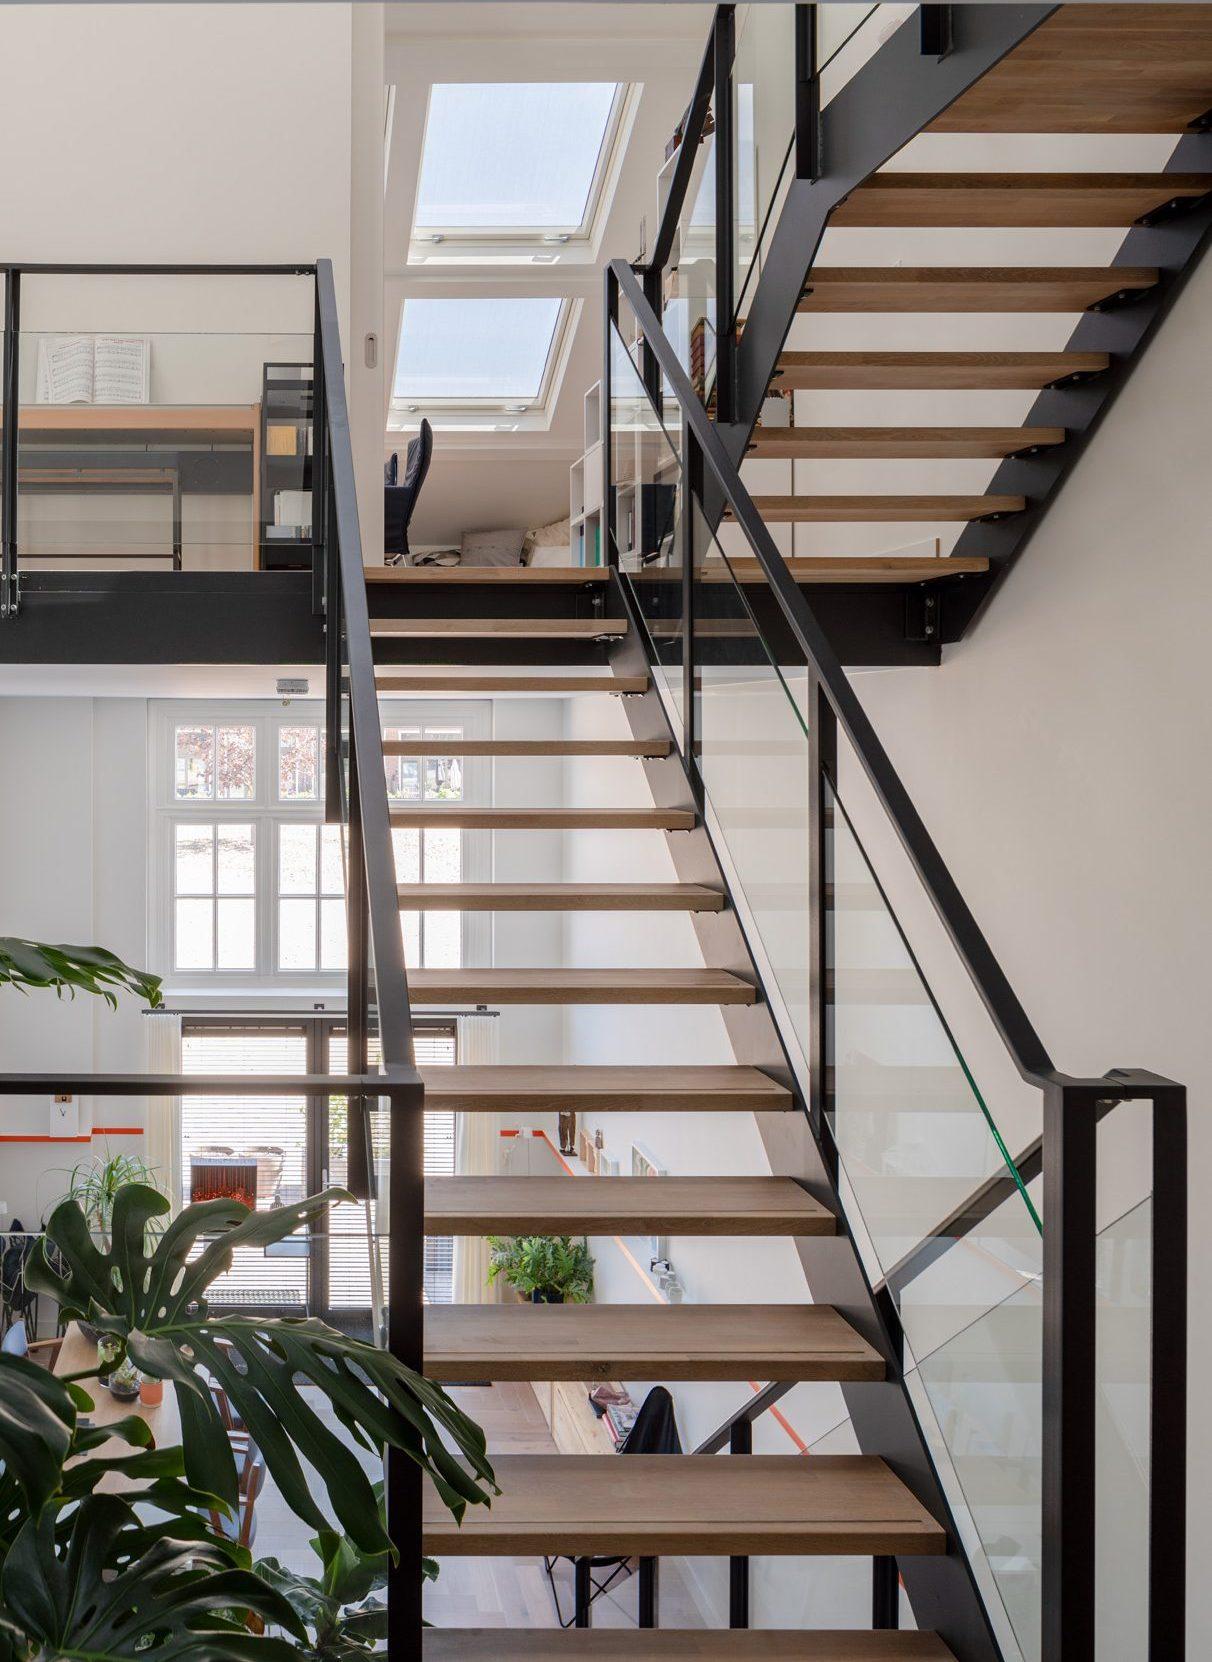 verbouw architect loft herbestemming